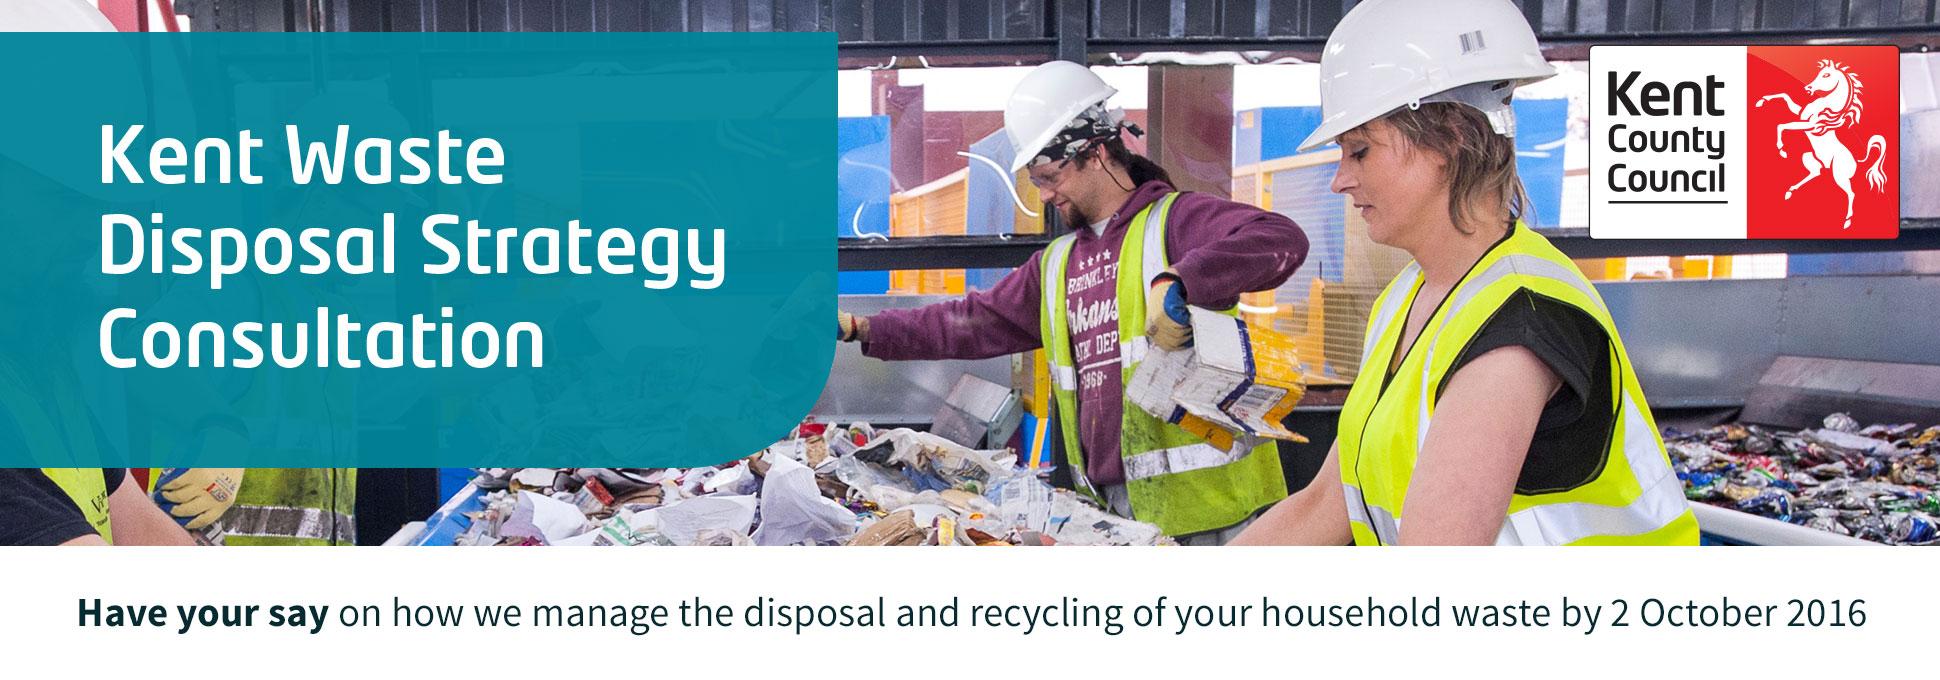 Waste-disposal-consultation-banner